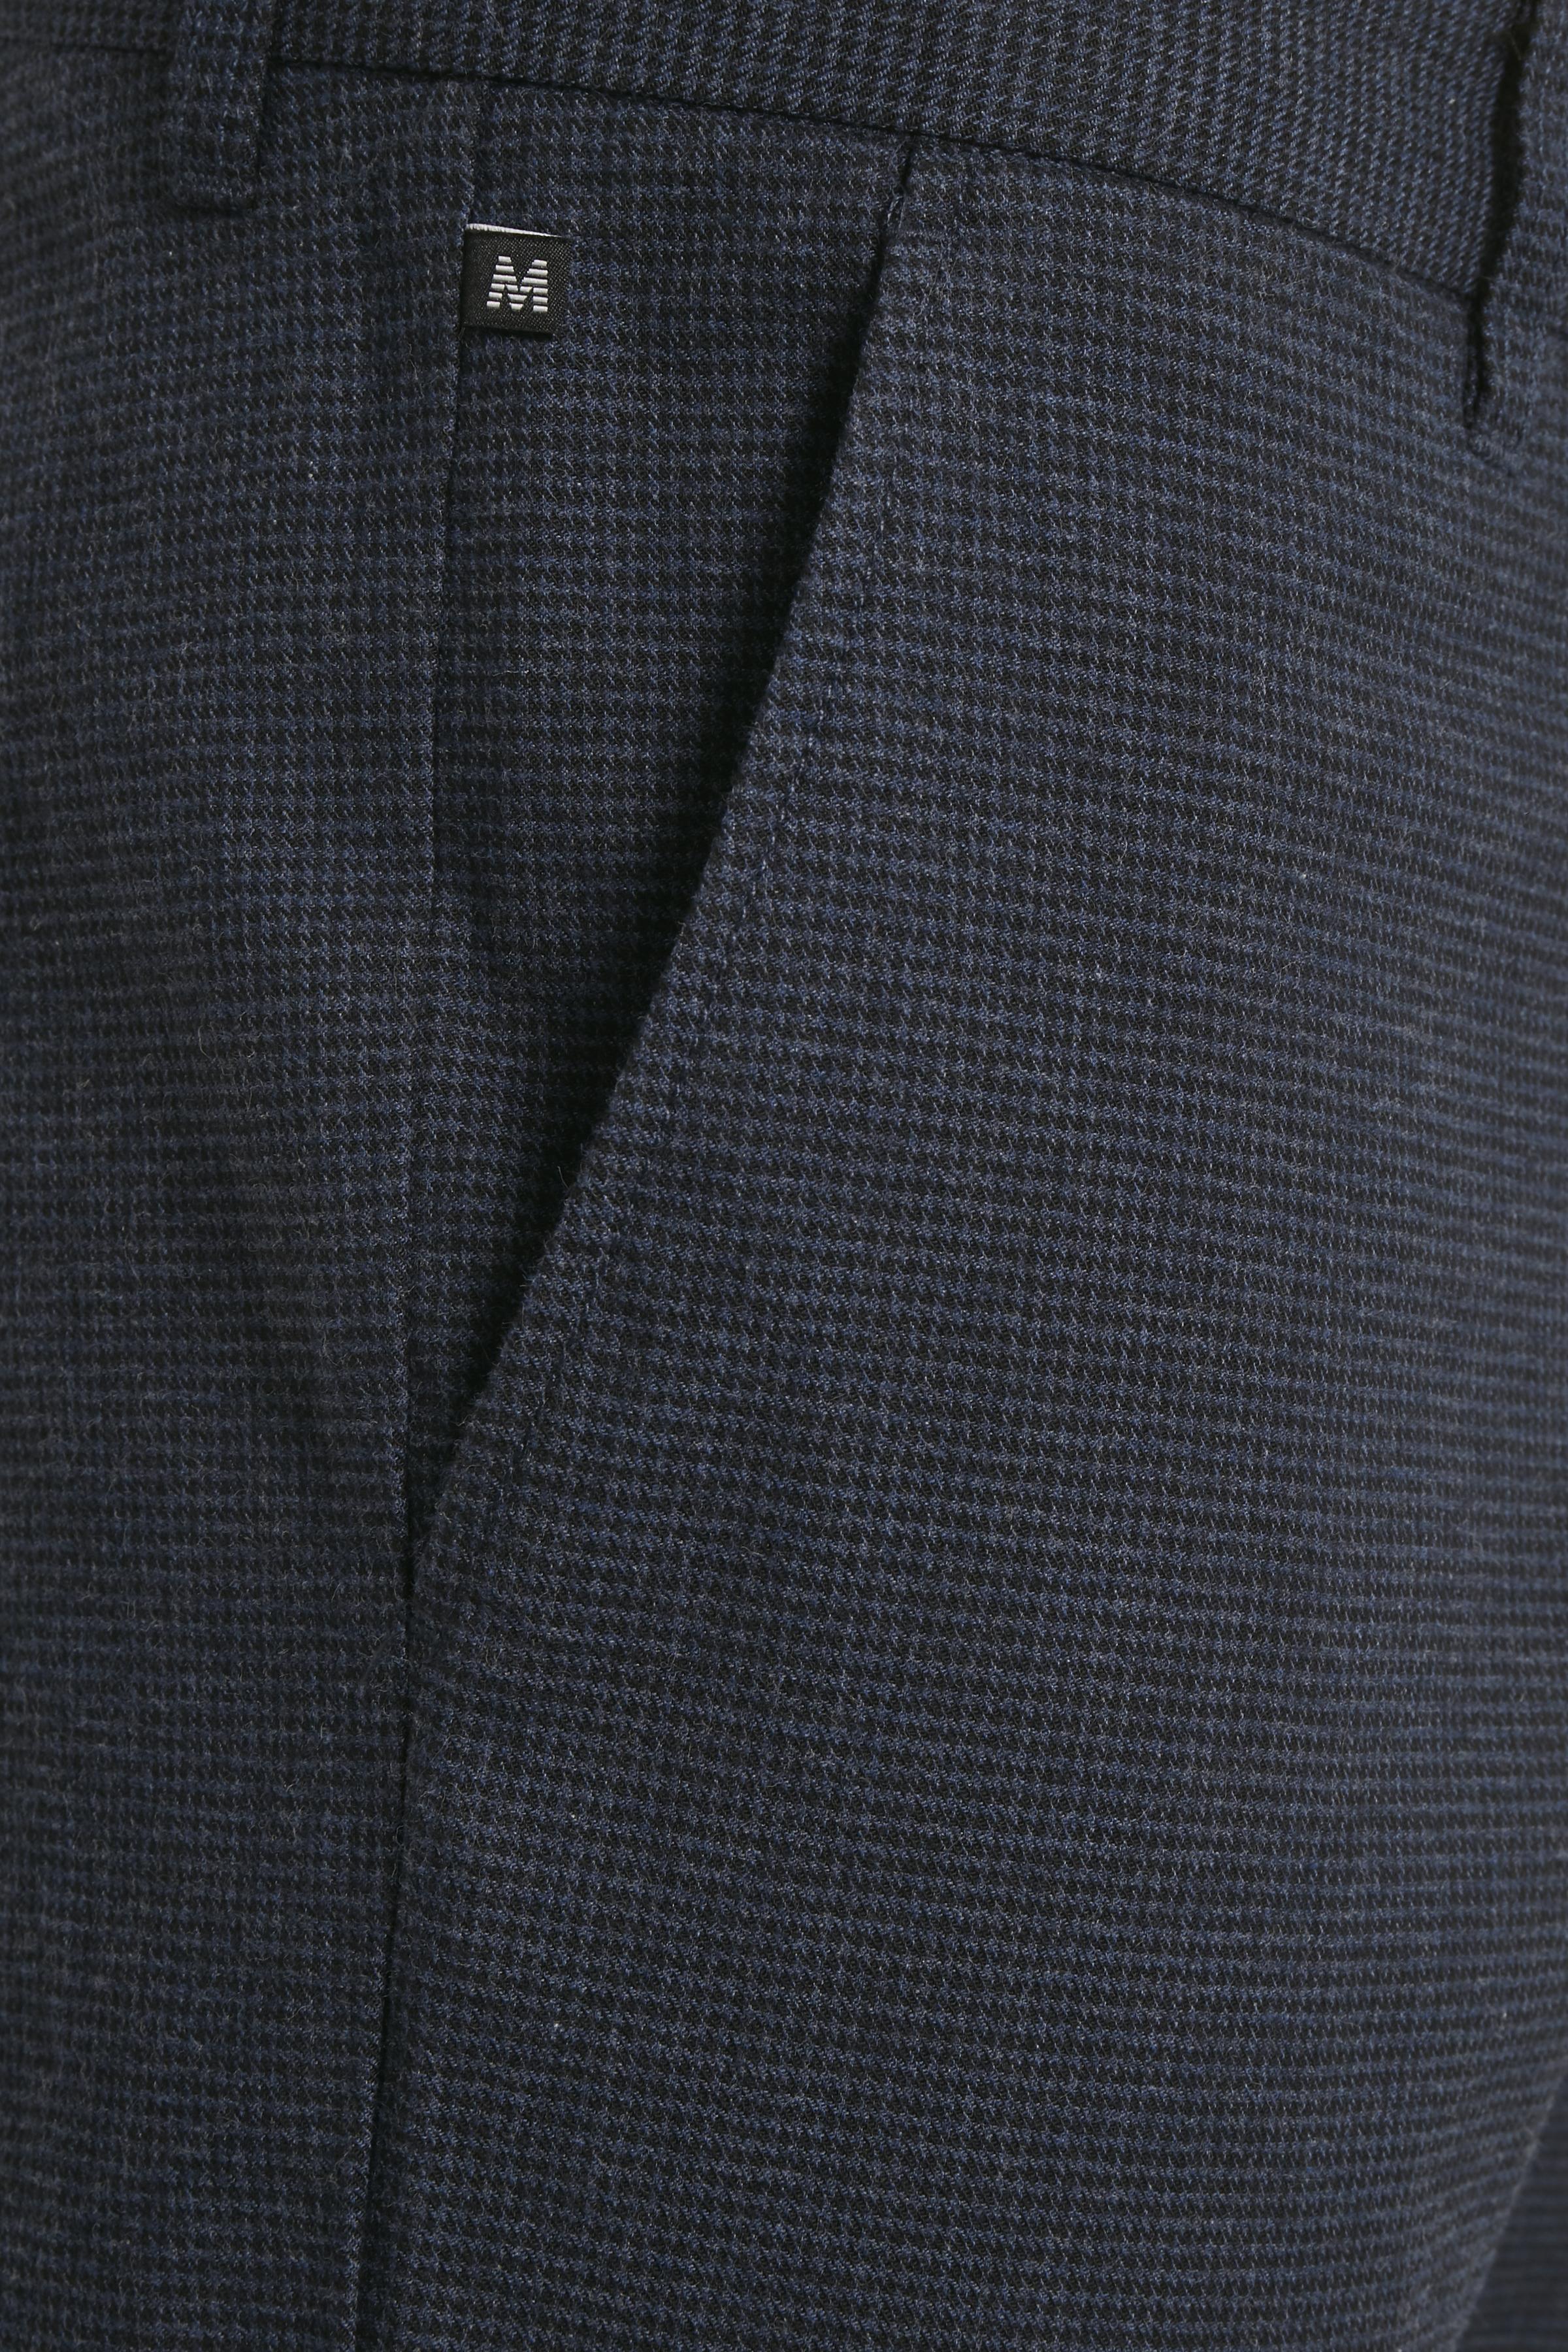 Dark Navy Casual buks – Køb Dark Navy Casual buks fra str. 28-40 her